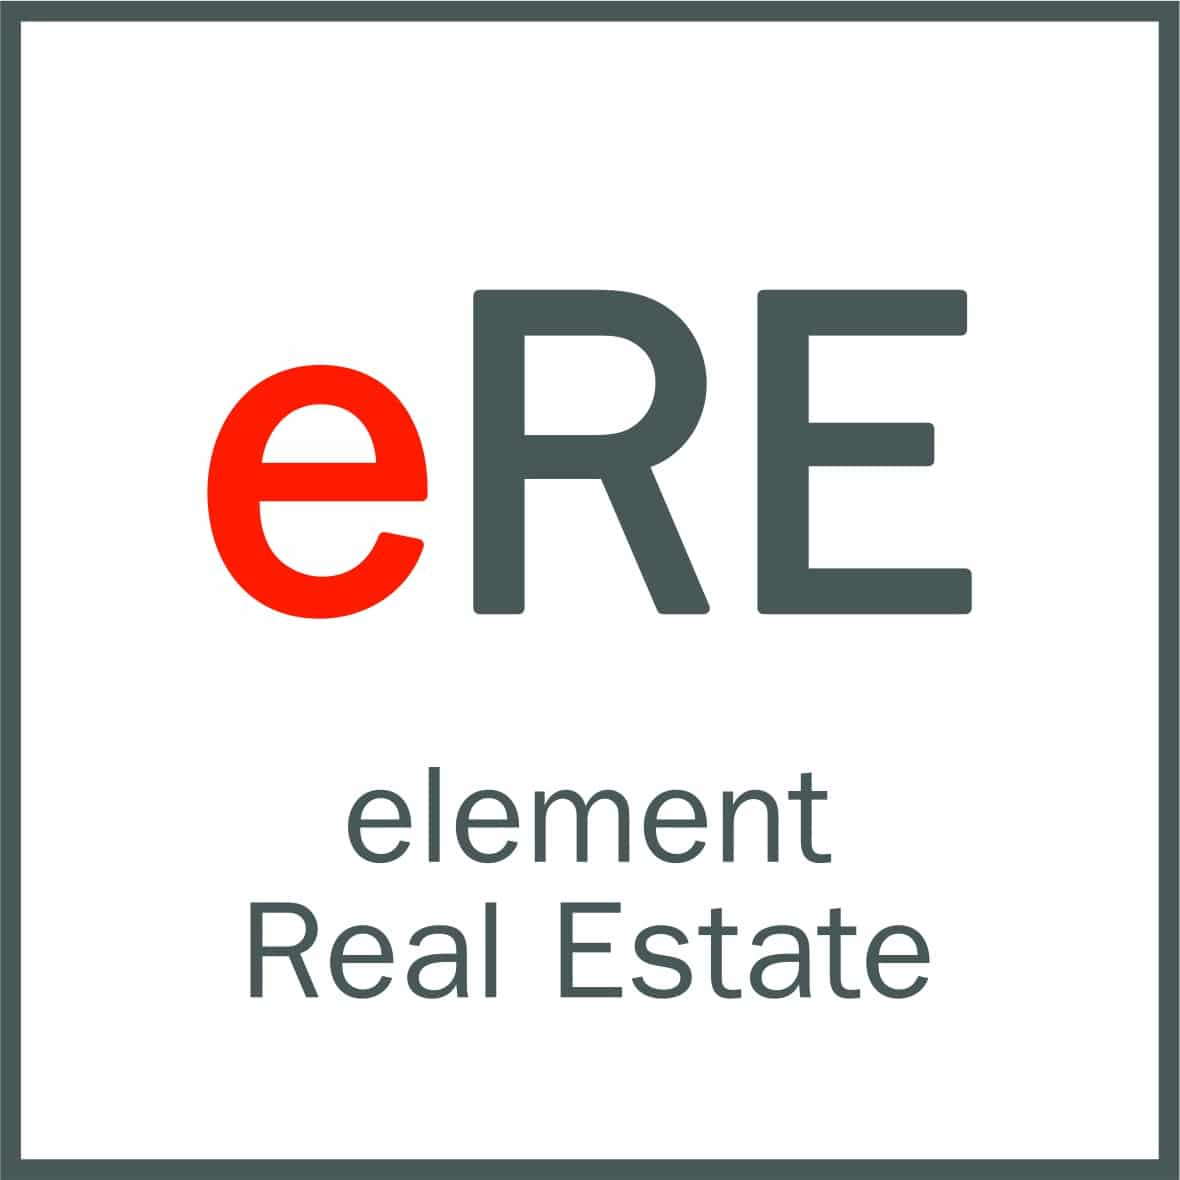 eRE - element Real Estate